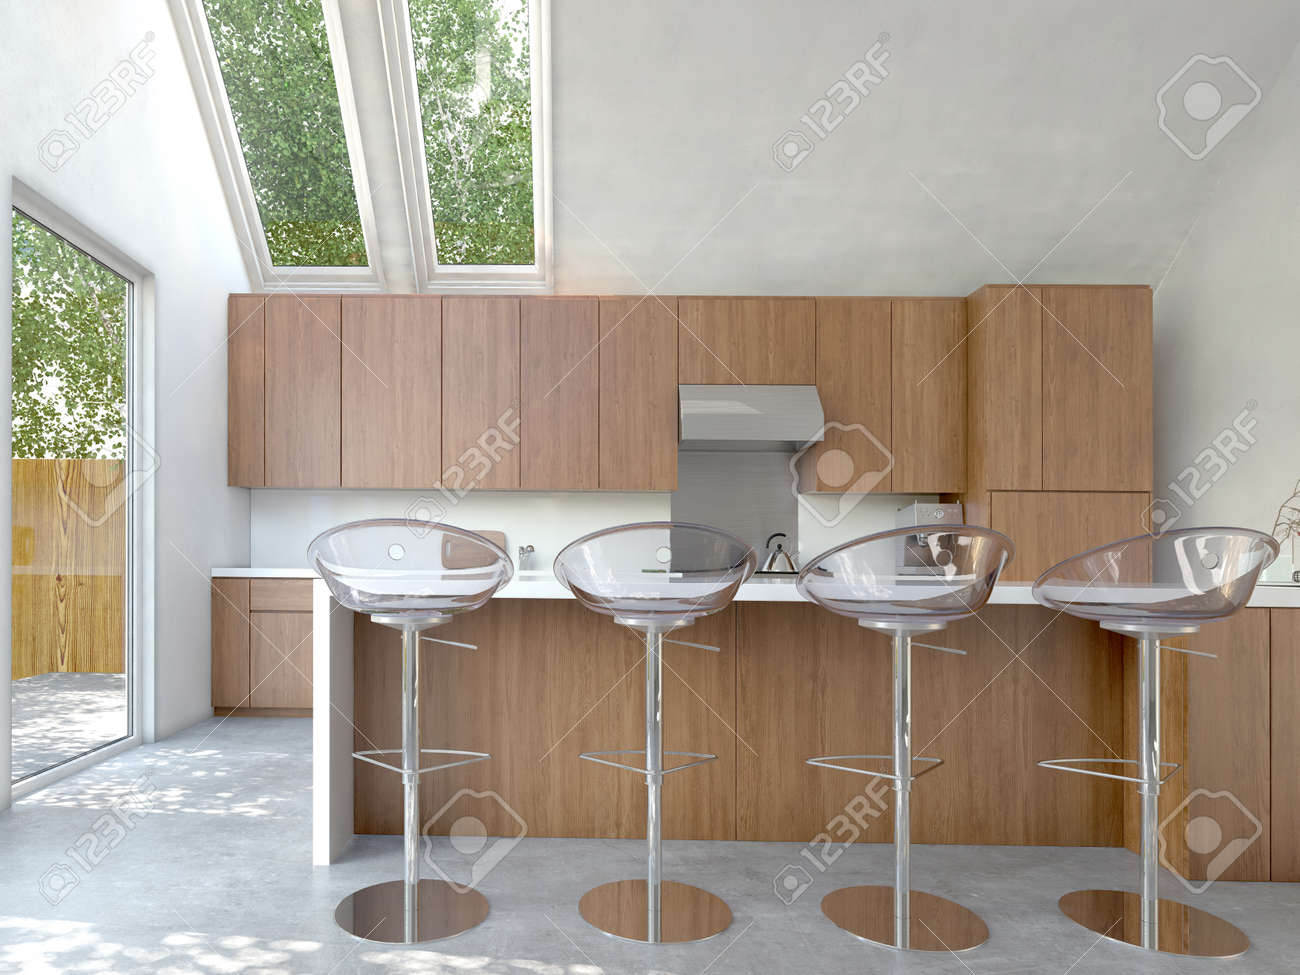 Pequeña Cocina Compacta De Planta Abierta O Interiores Cocina Con ...